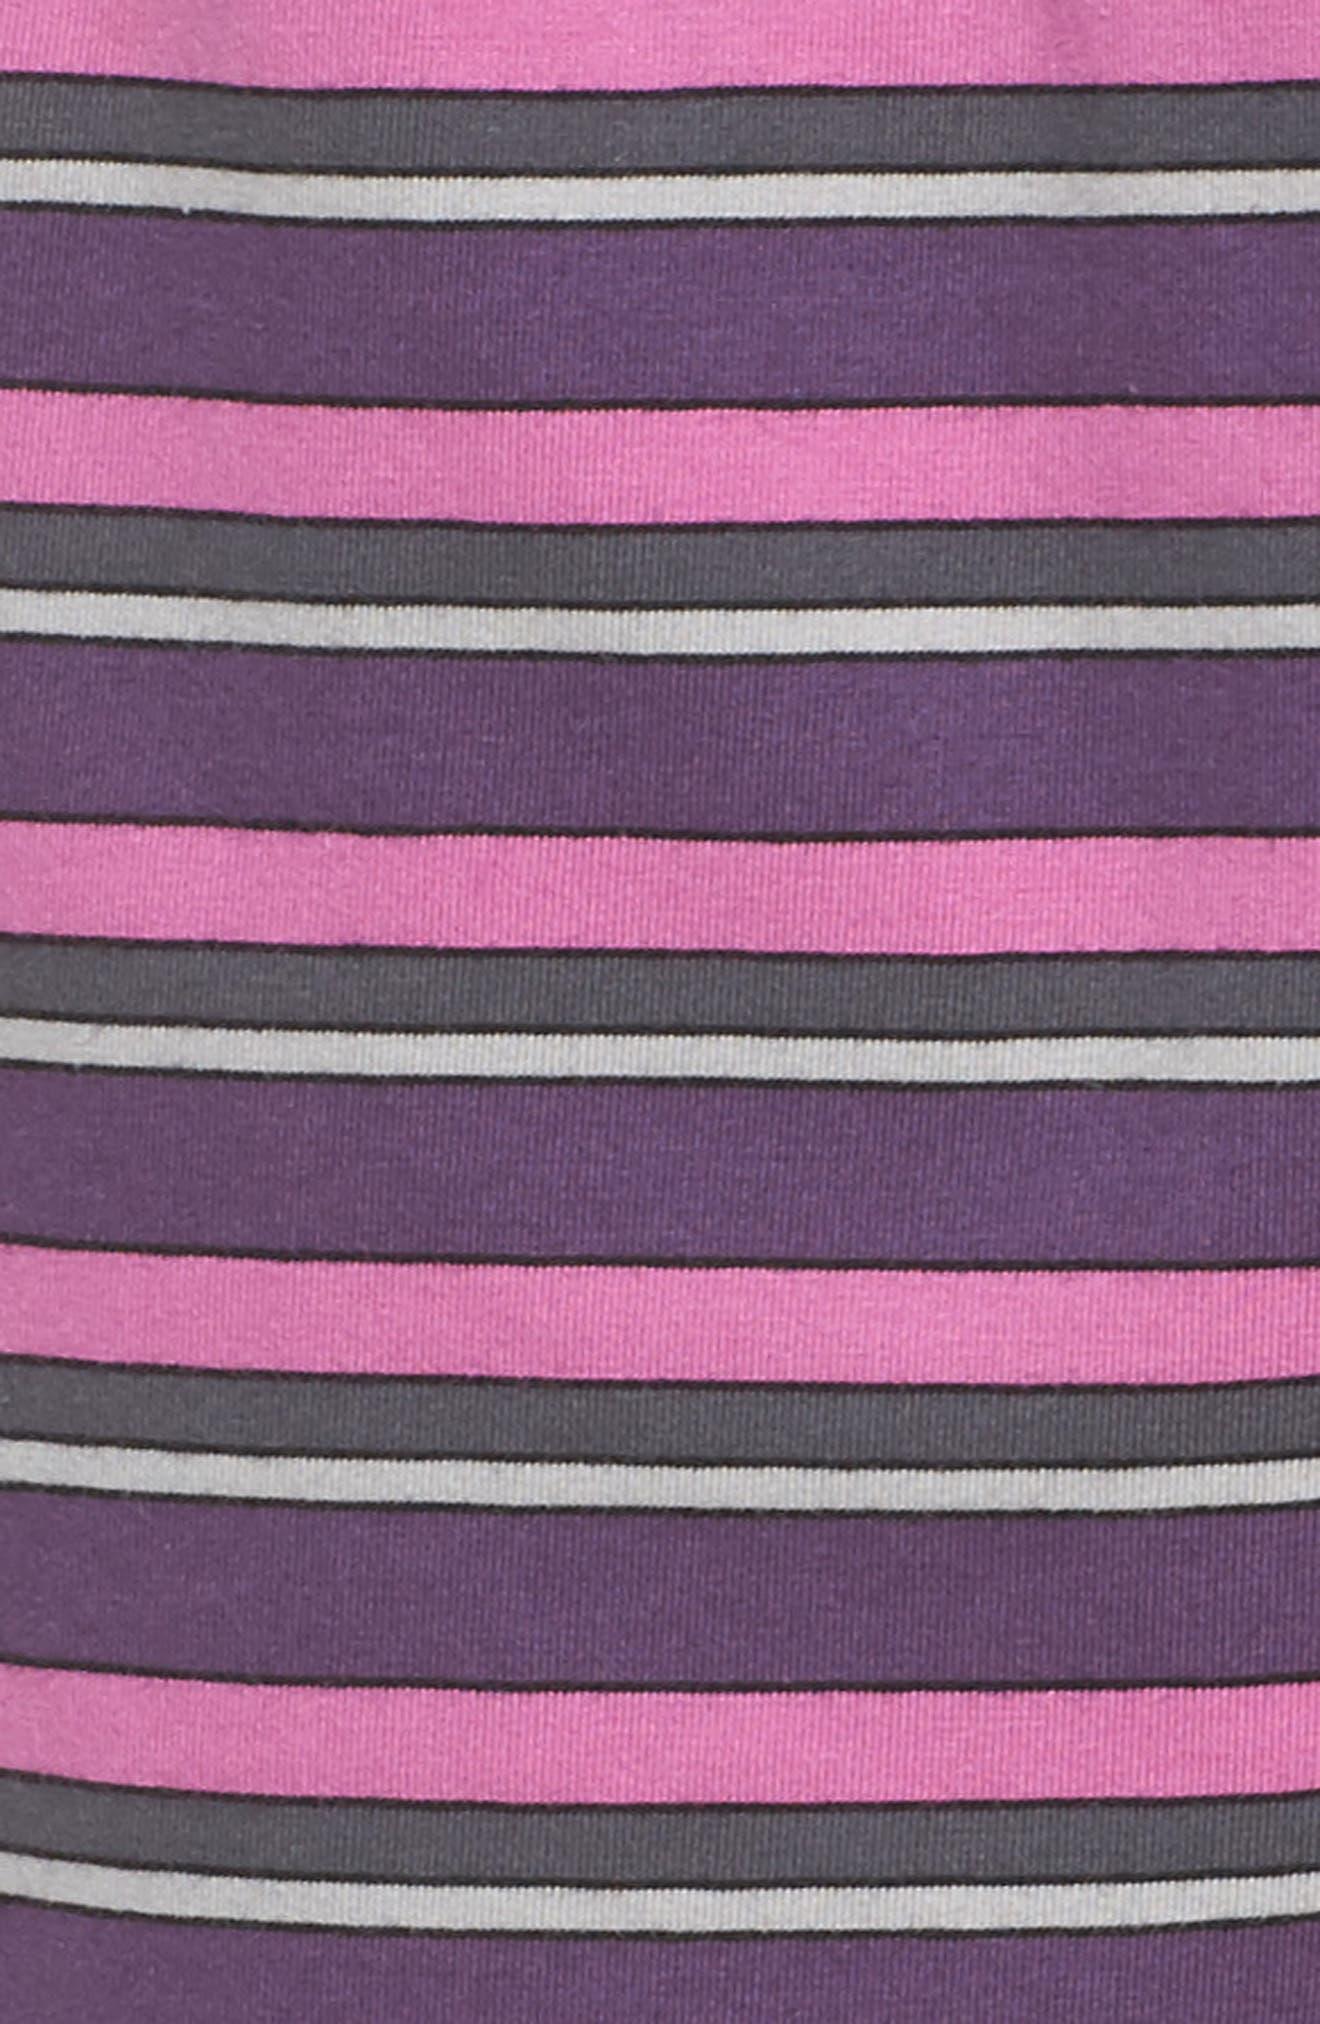 Pajama Shorts,                             Alternate thumbnail 7, color,                             Currant Stripe